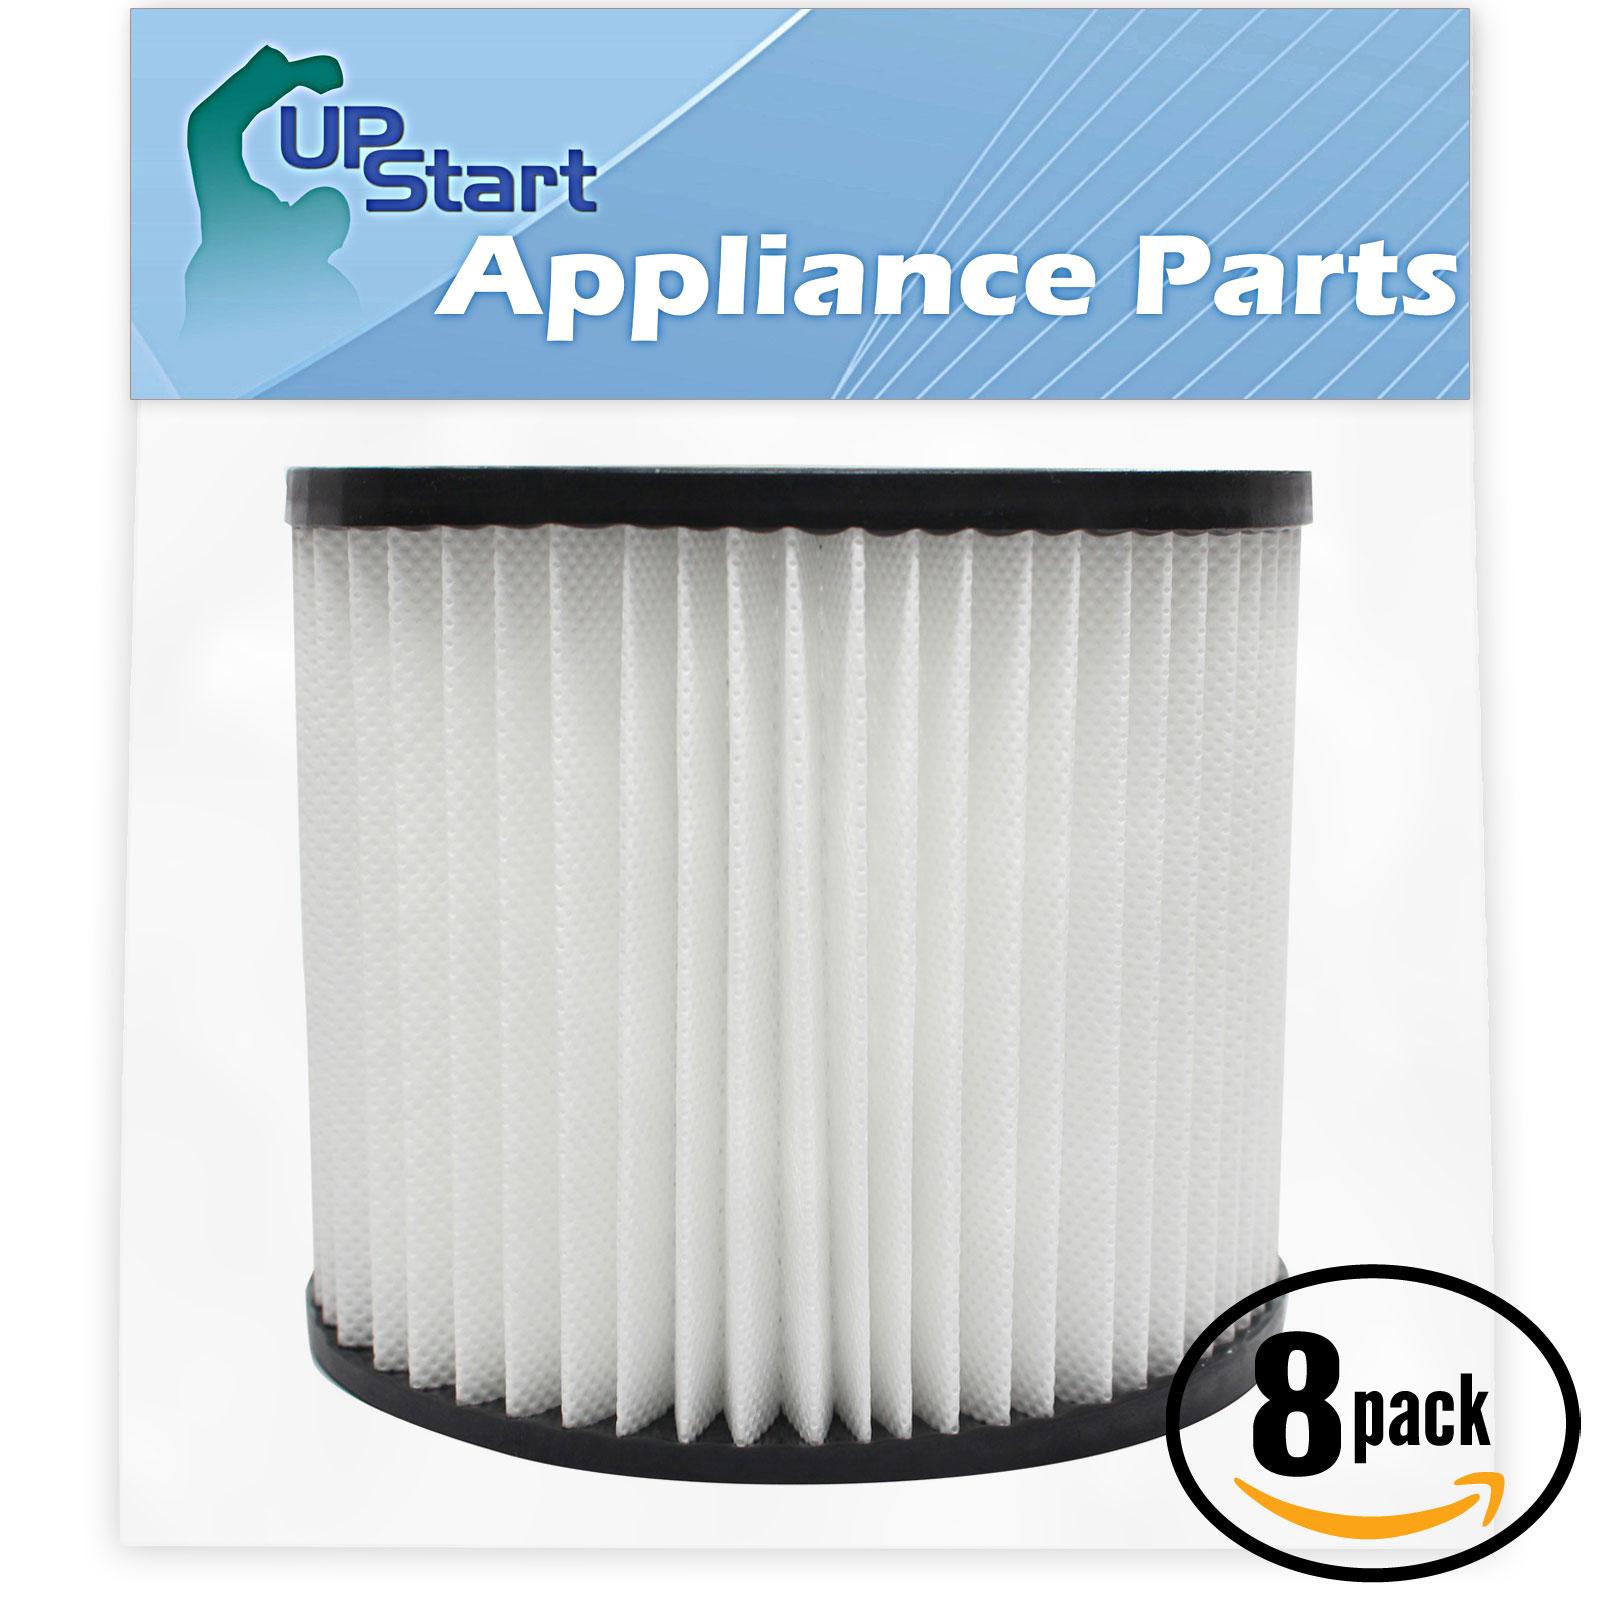 UpStart 8-Pack Replacement Shop-Vac 90398 Vacuum Cartridg...